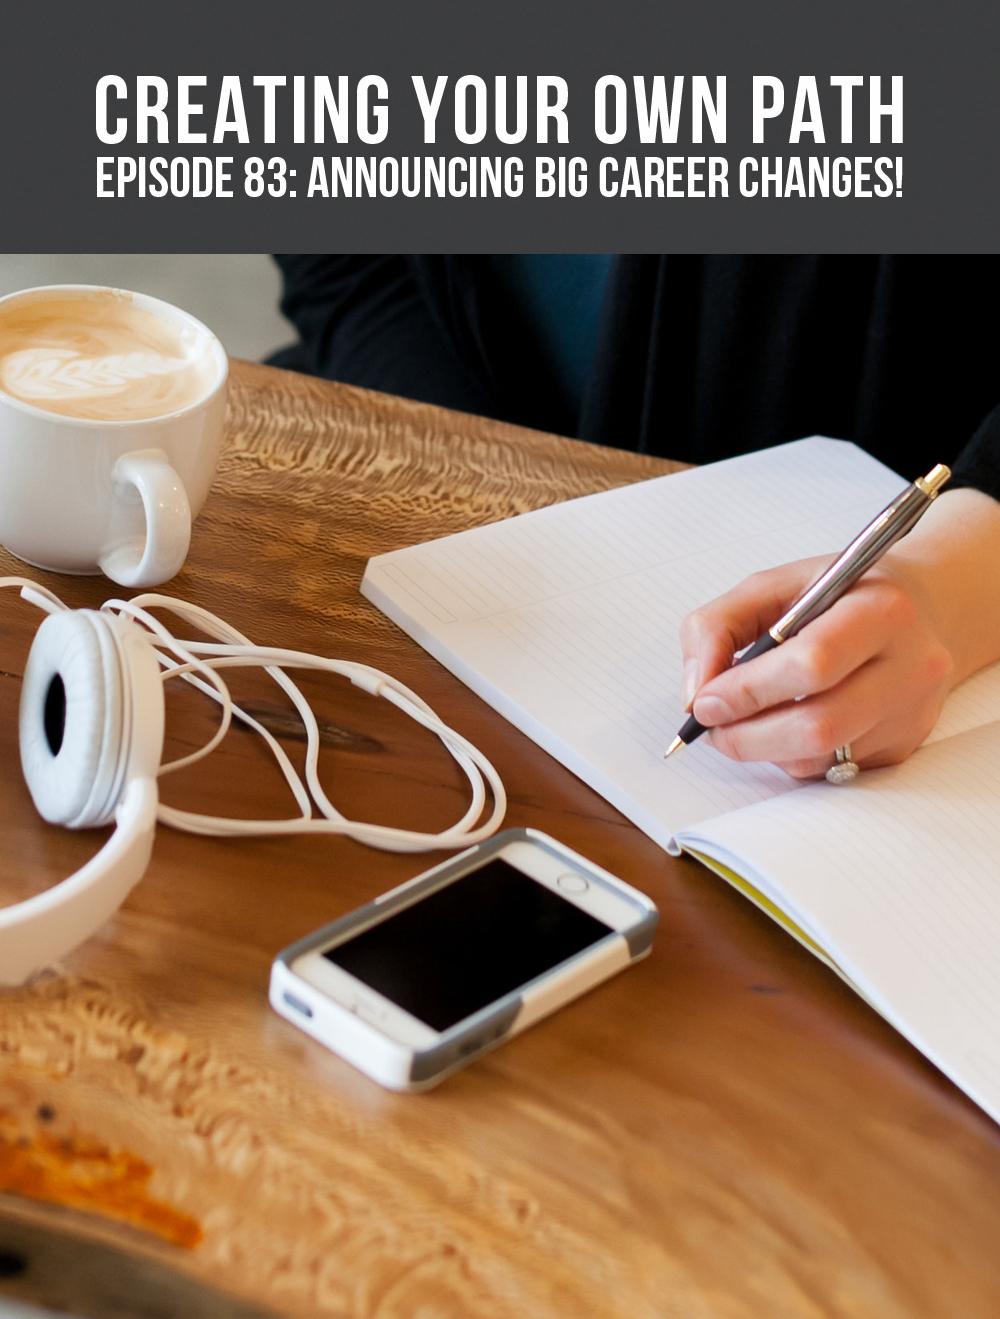 CYOP #83 - Mini Episode: I'm Sharing Some BIG Career News! // creatingyourownpath.com